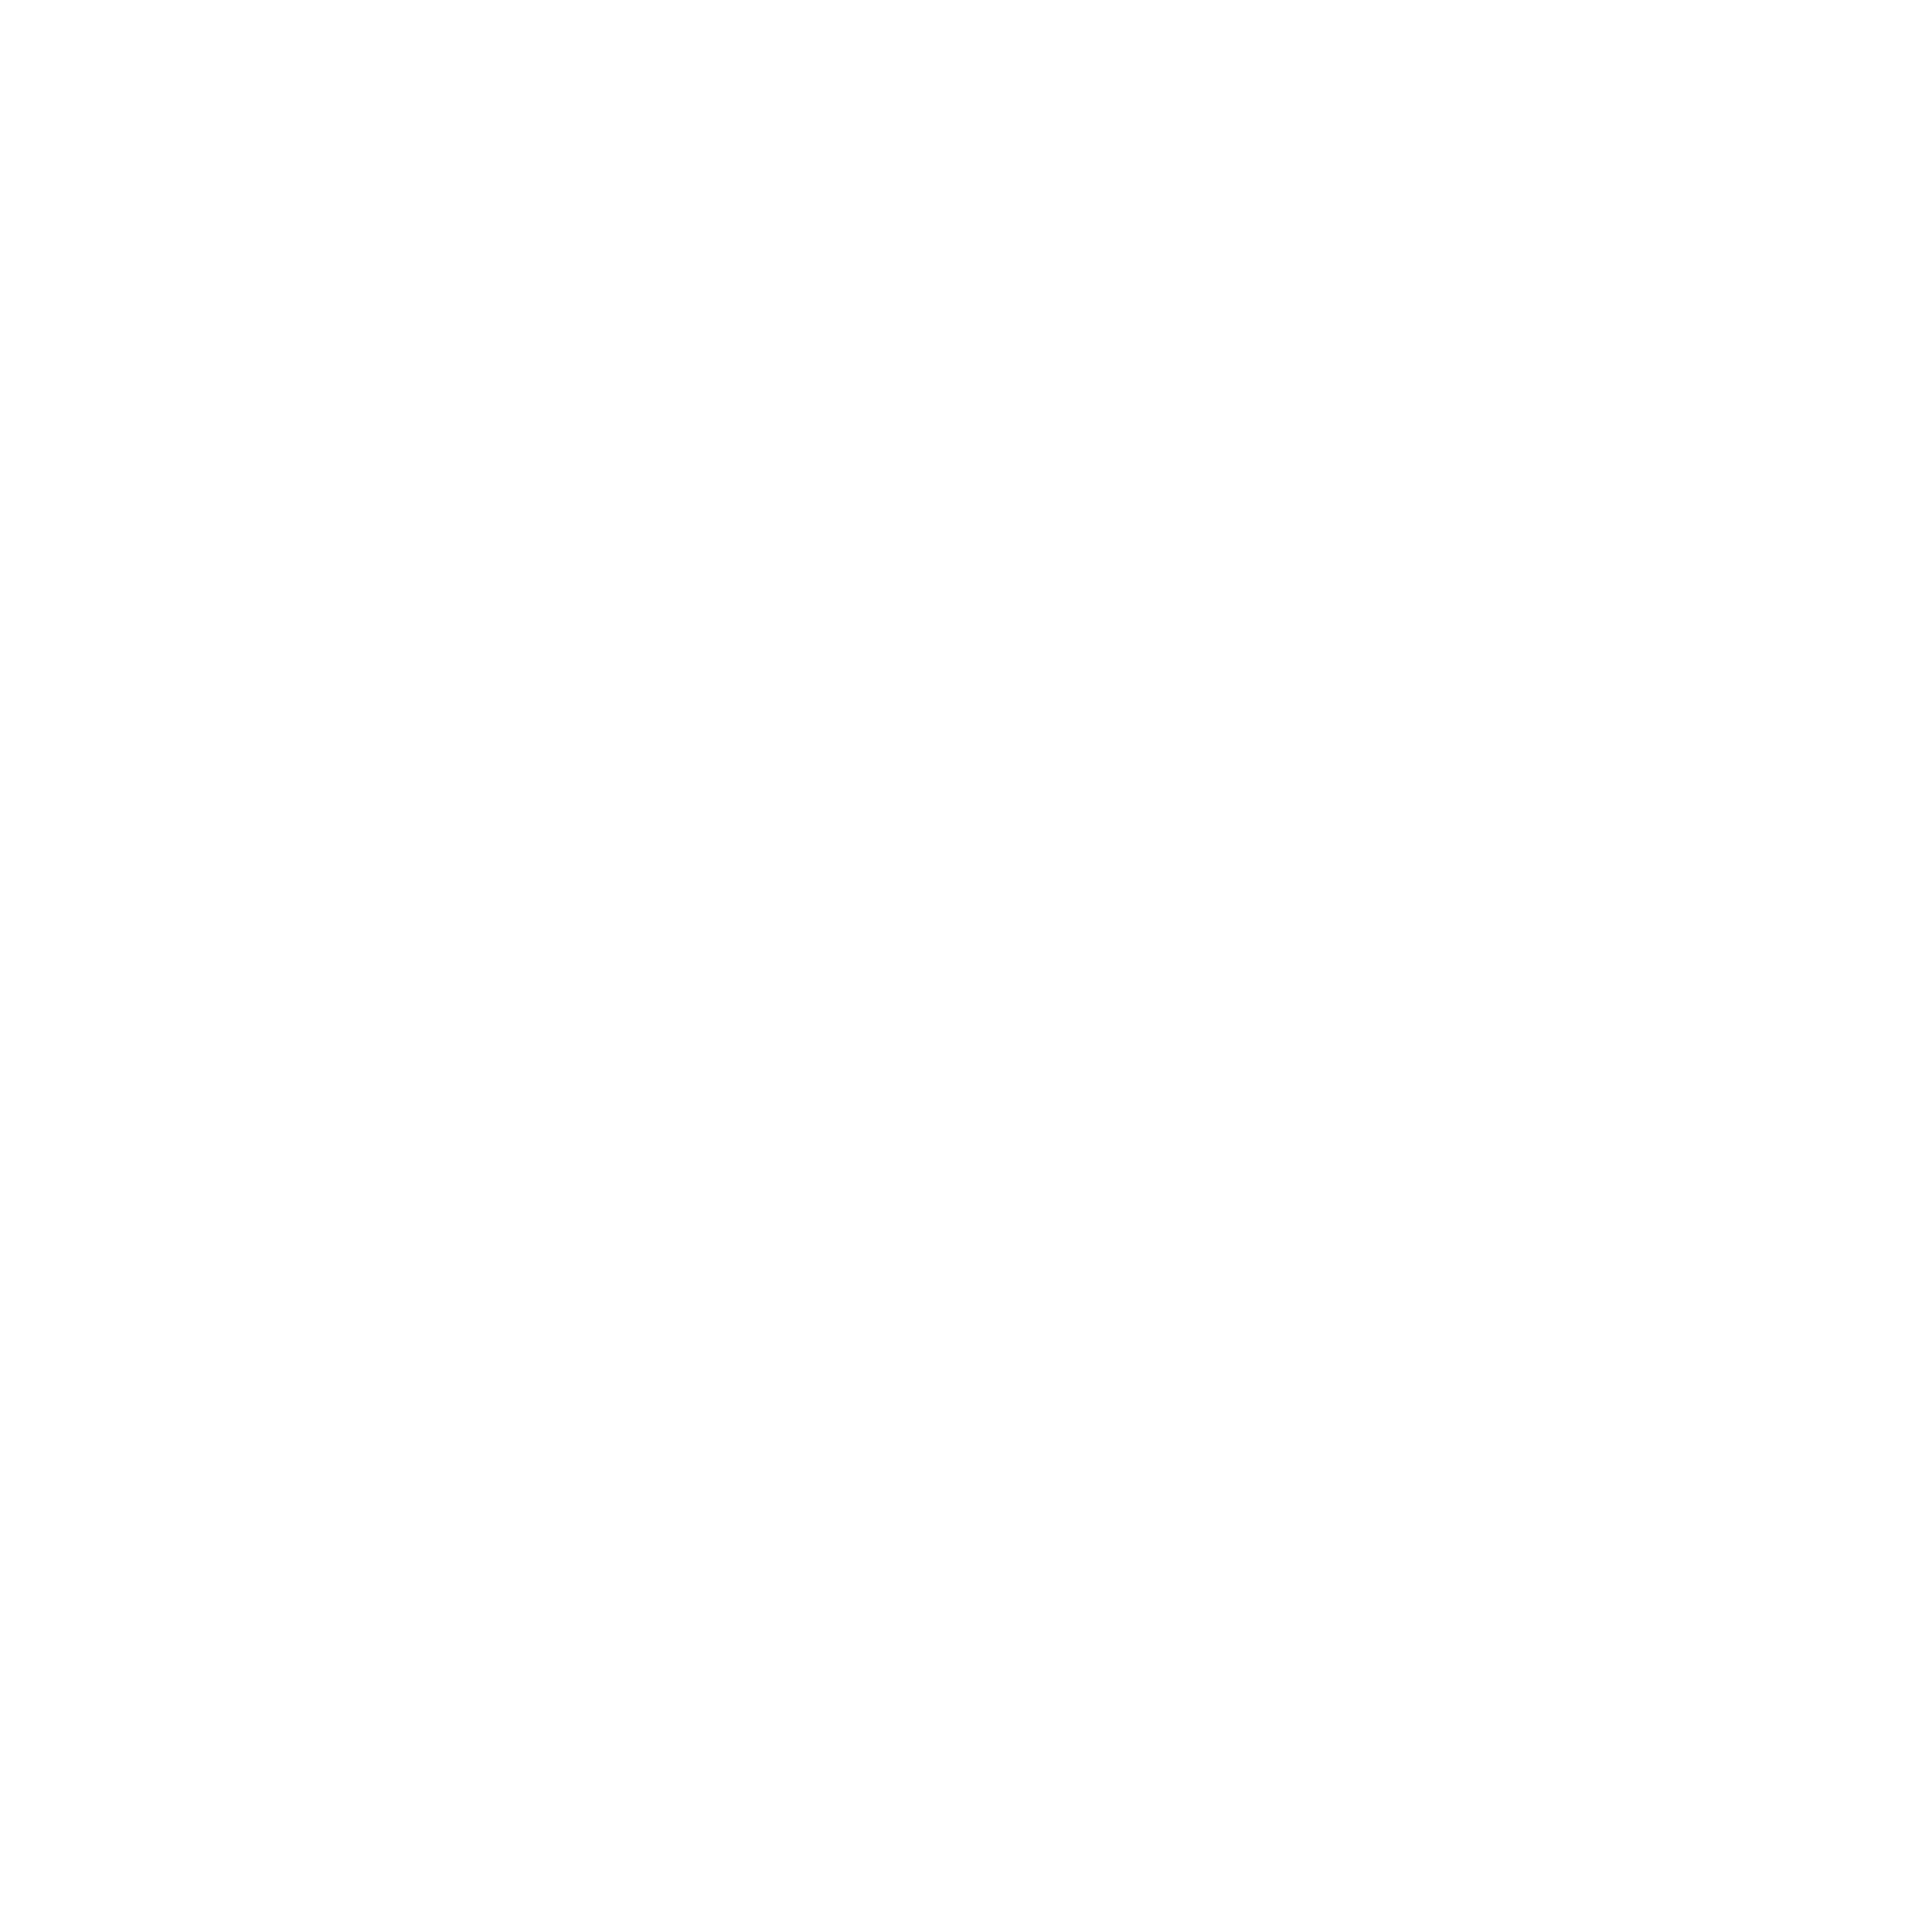 Militech Assets Small Showcase-01.jpg